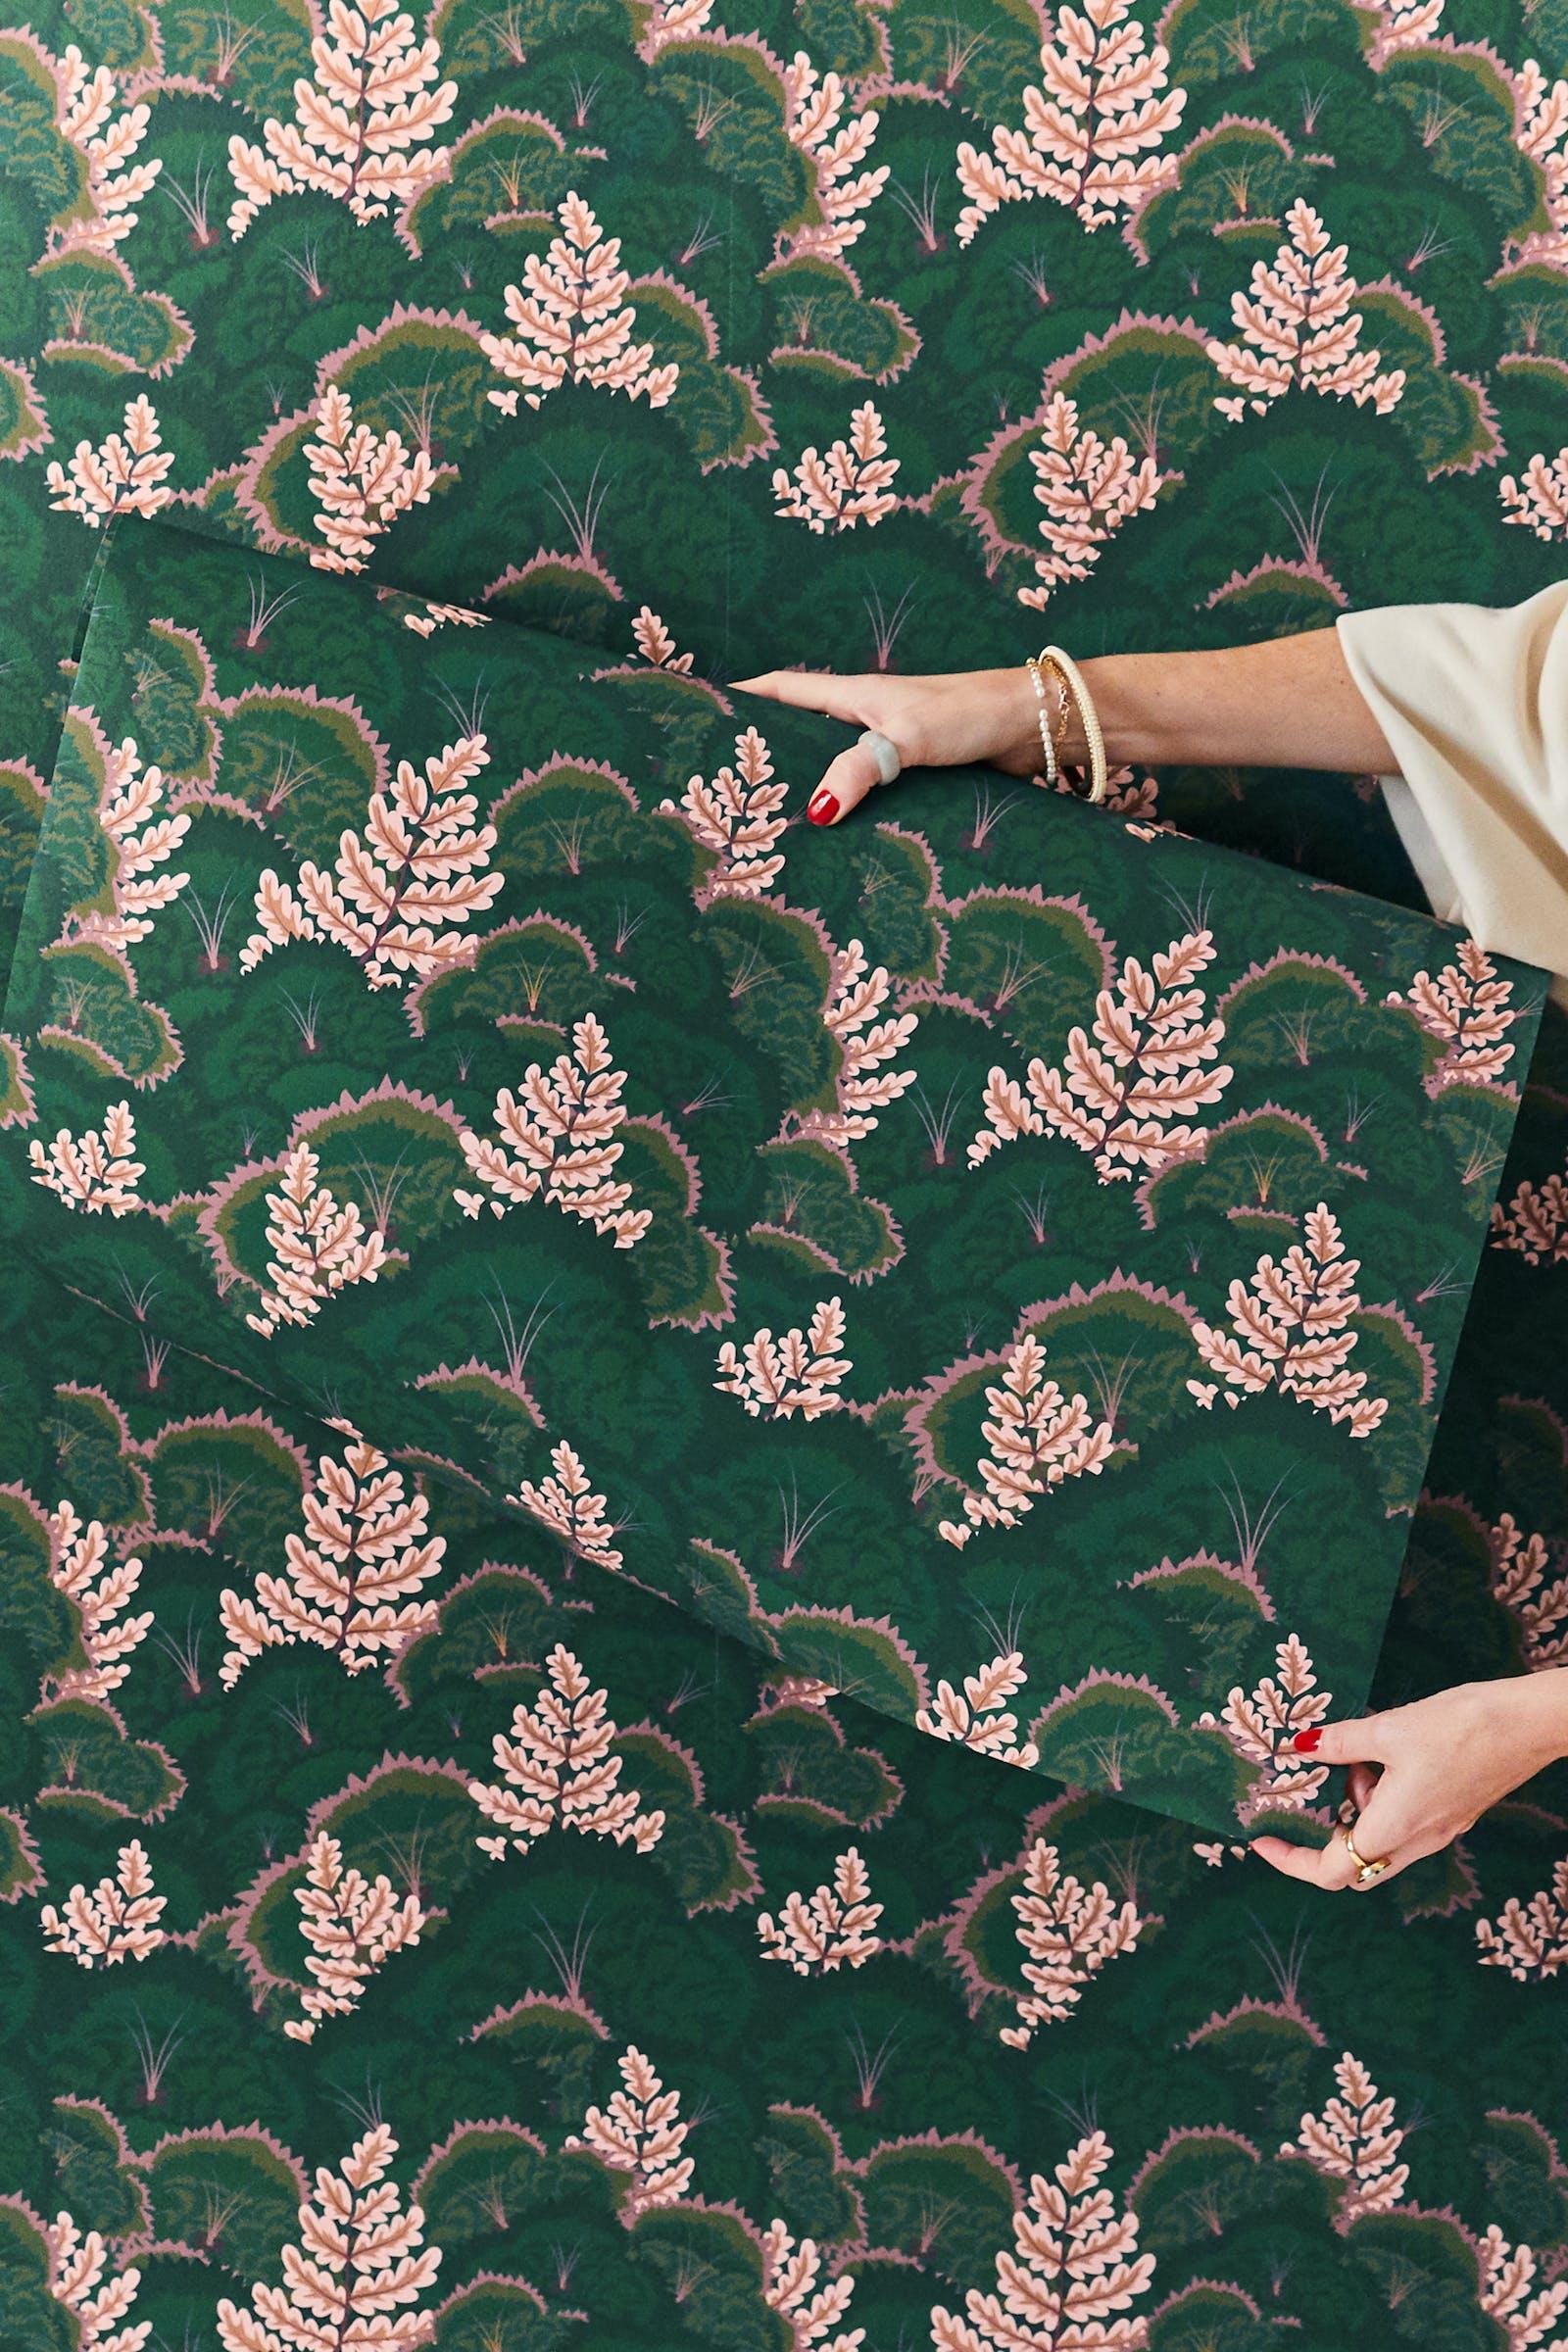 Woman holding Lick x Natasha Coverdale Electric Poppies 02 wallpaper